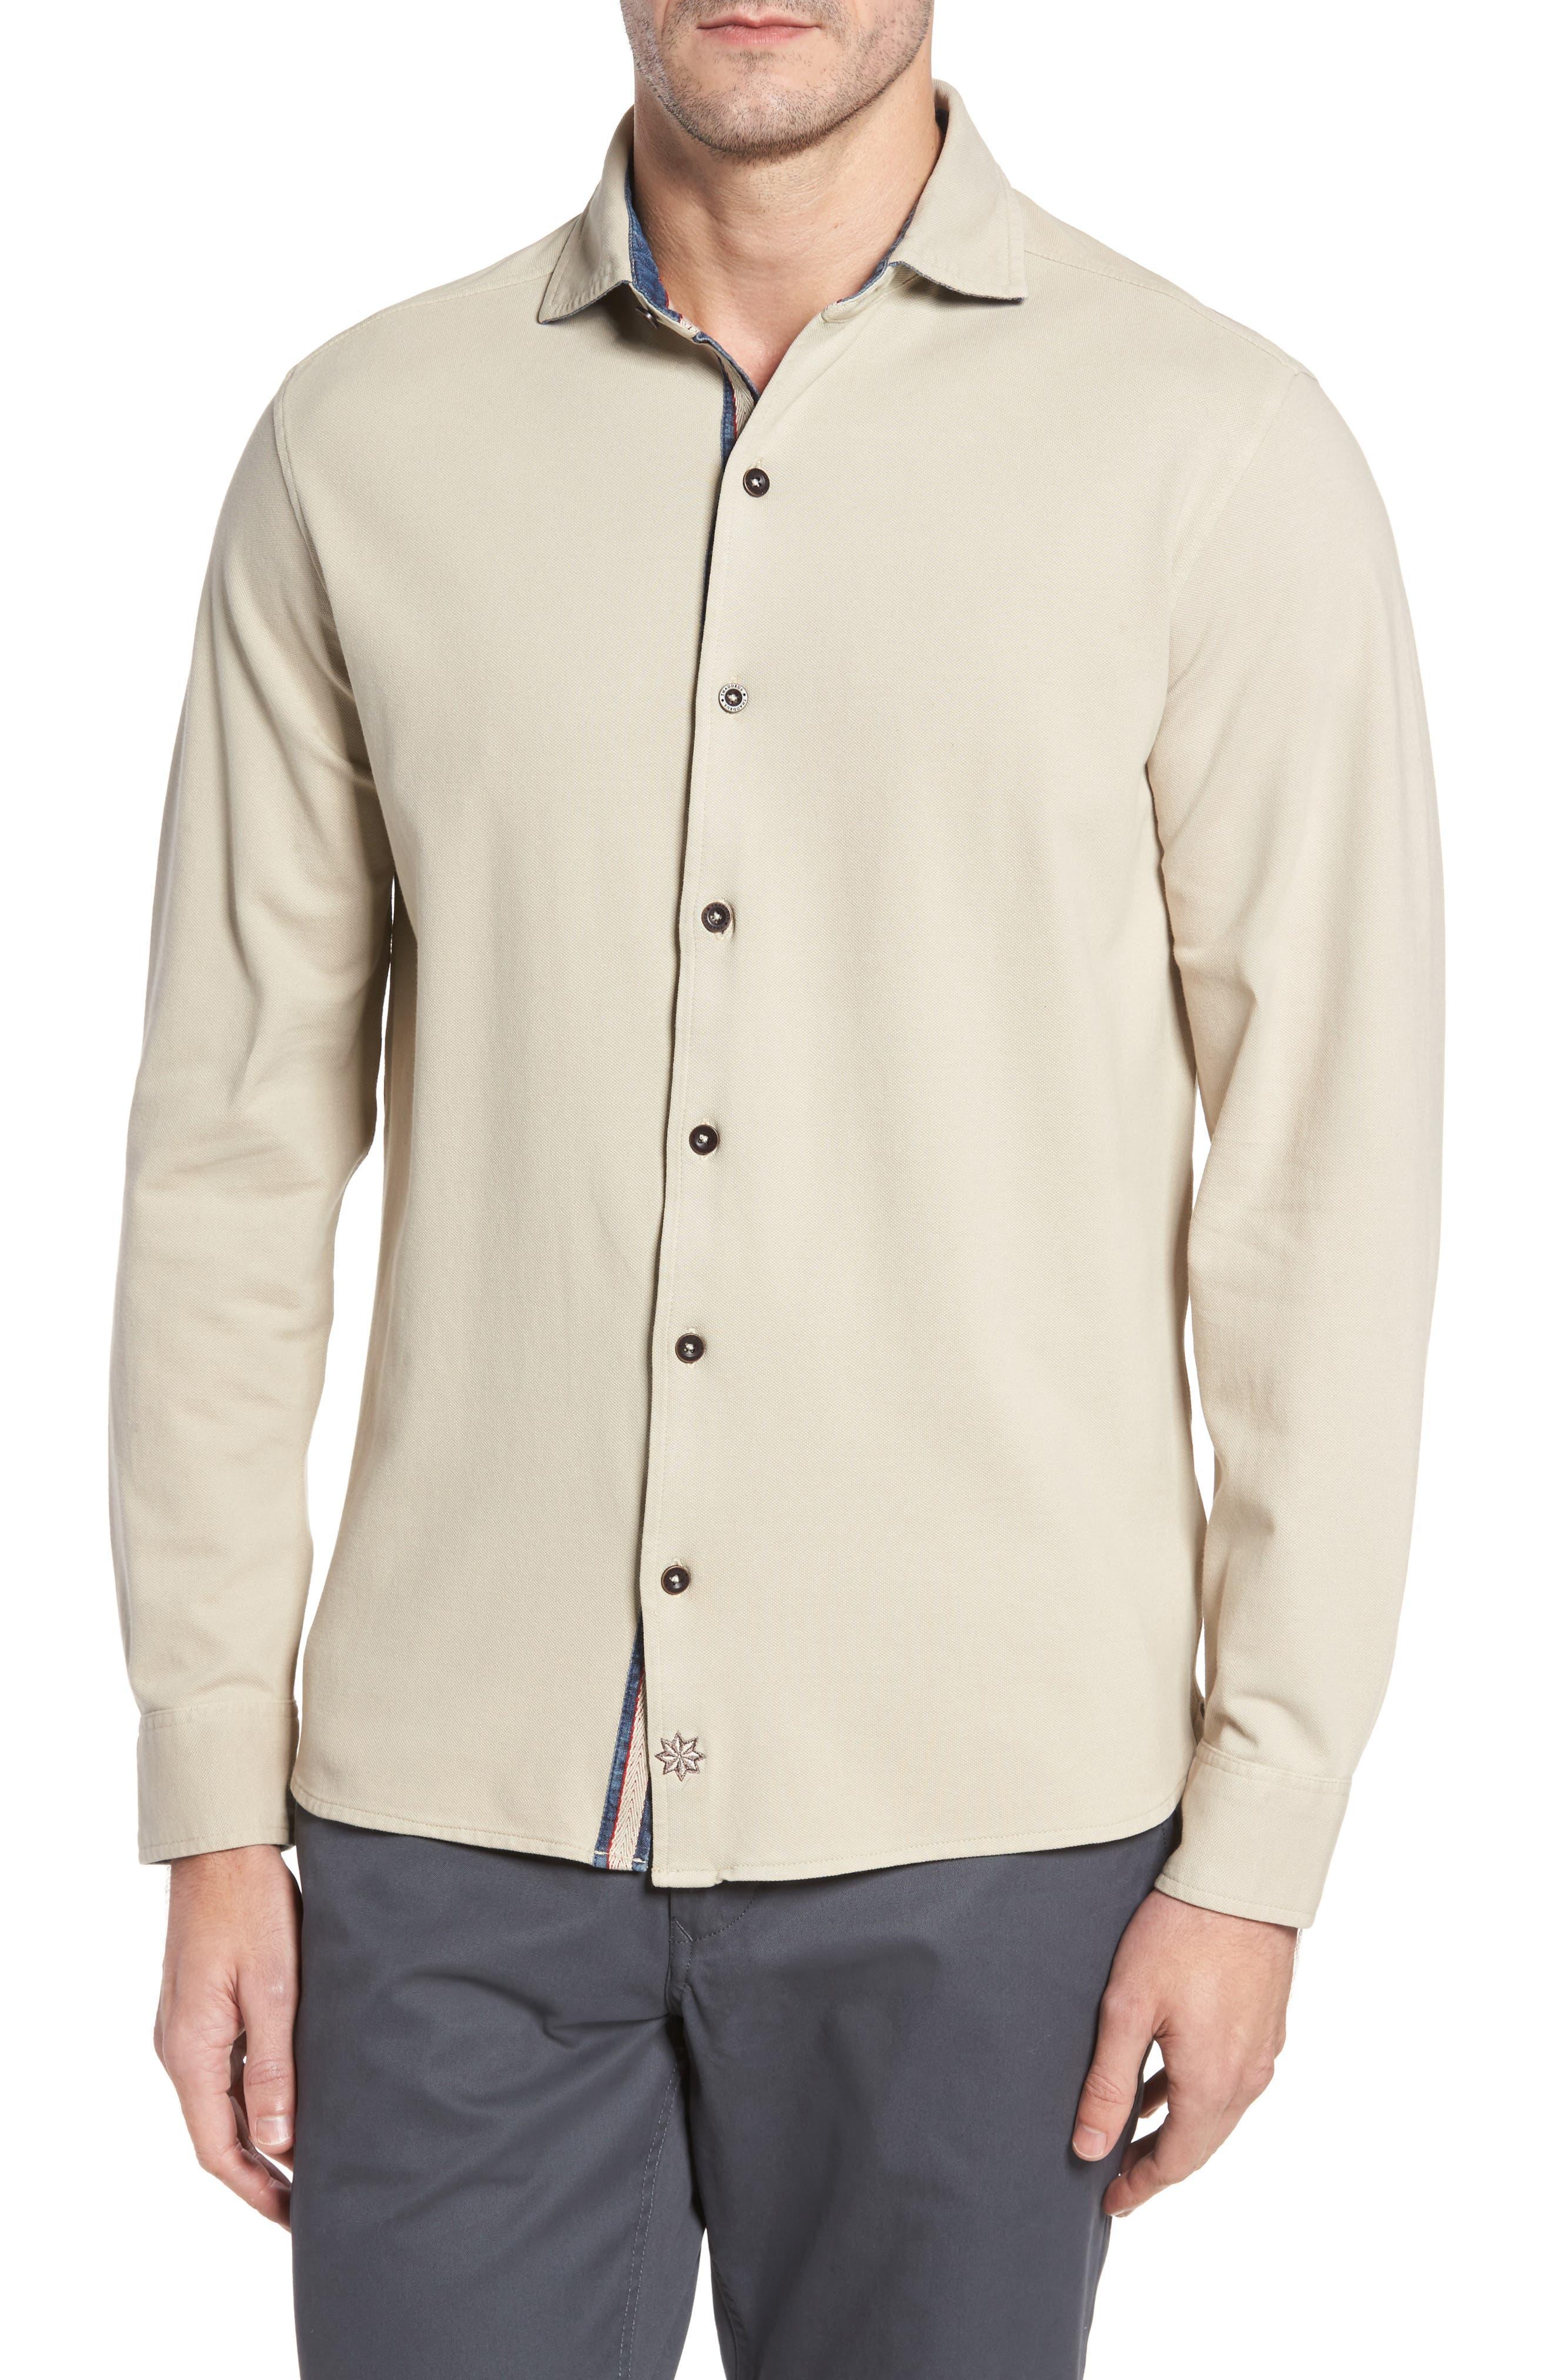 Shively Piqué Knit Sport Shirt,                         Main,                         color, Stone